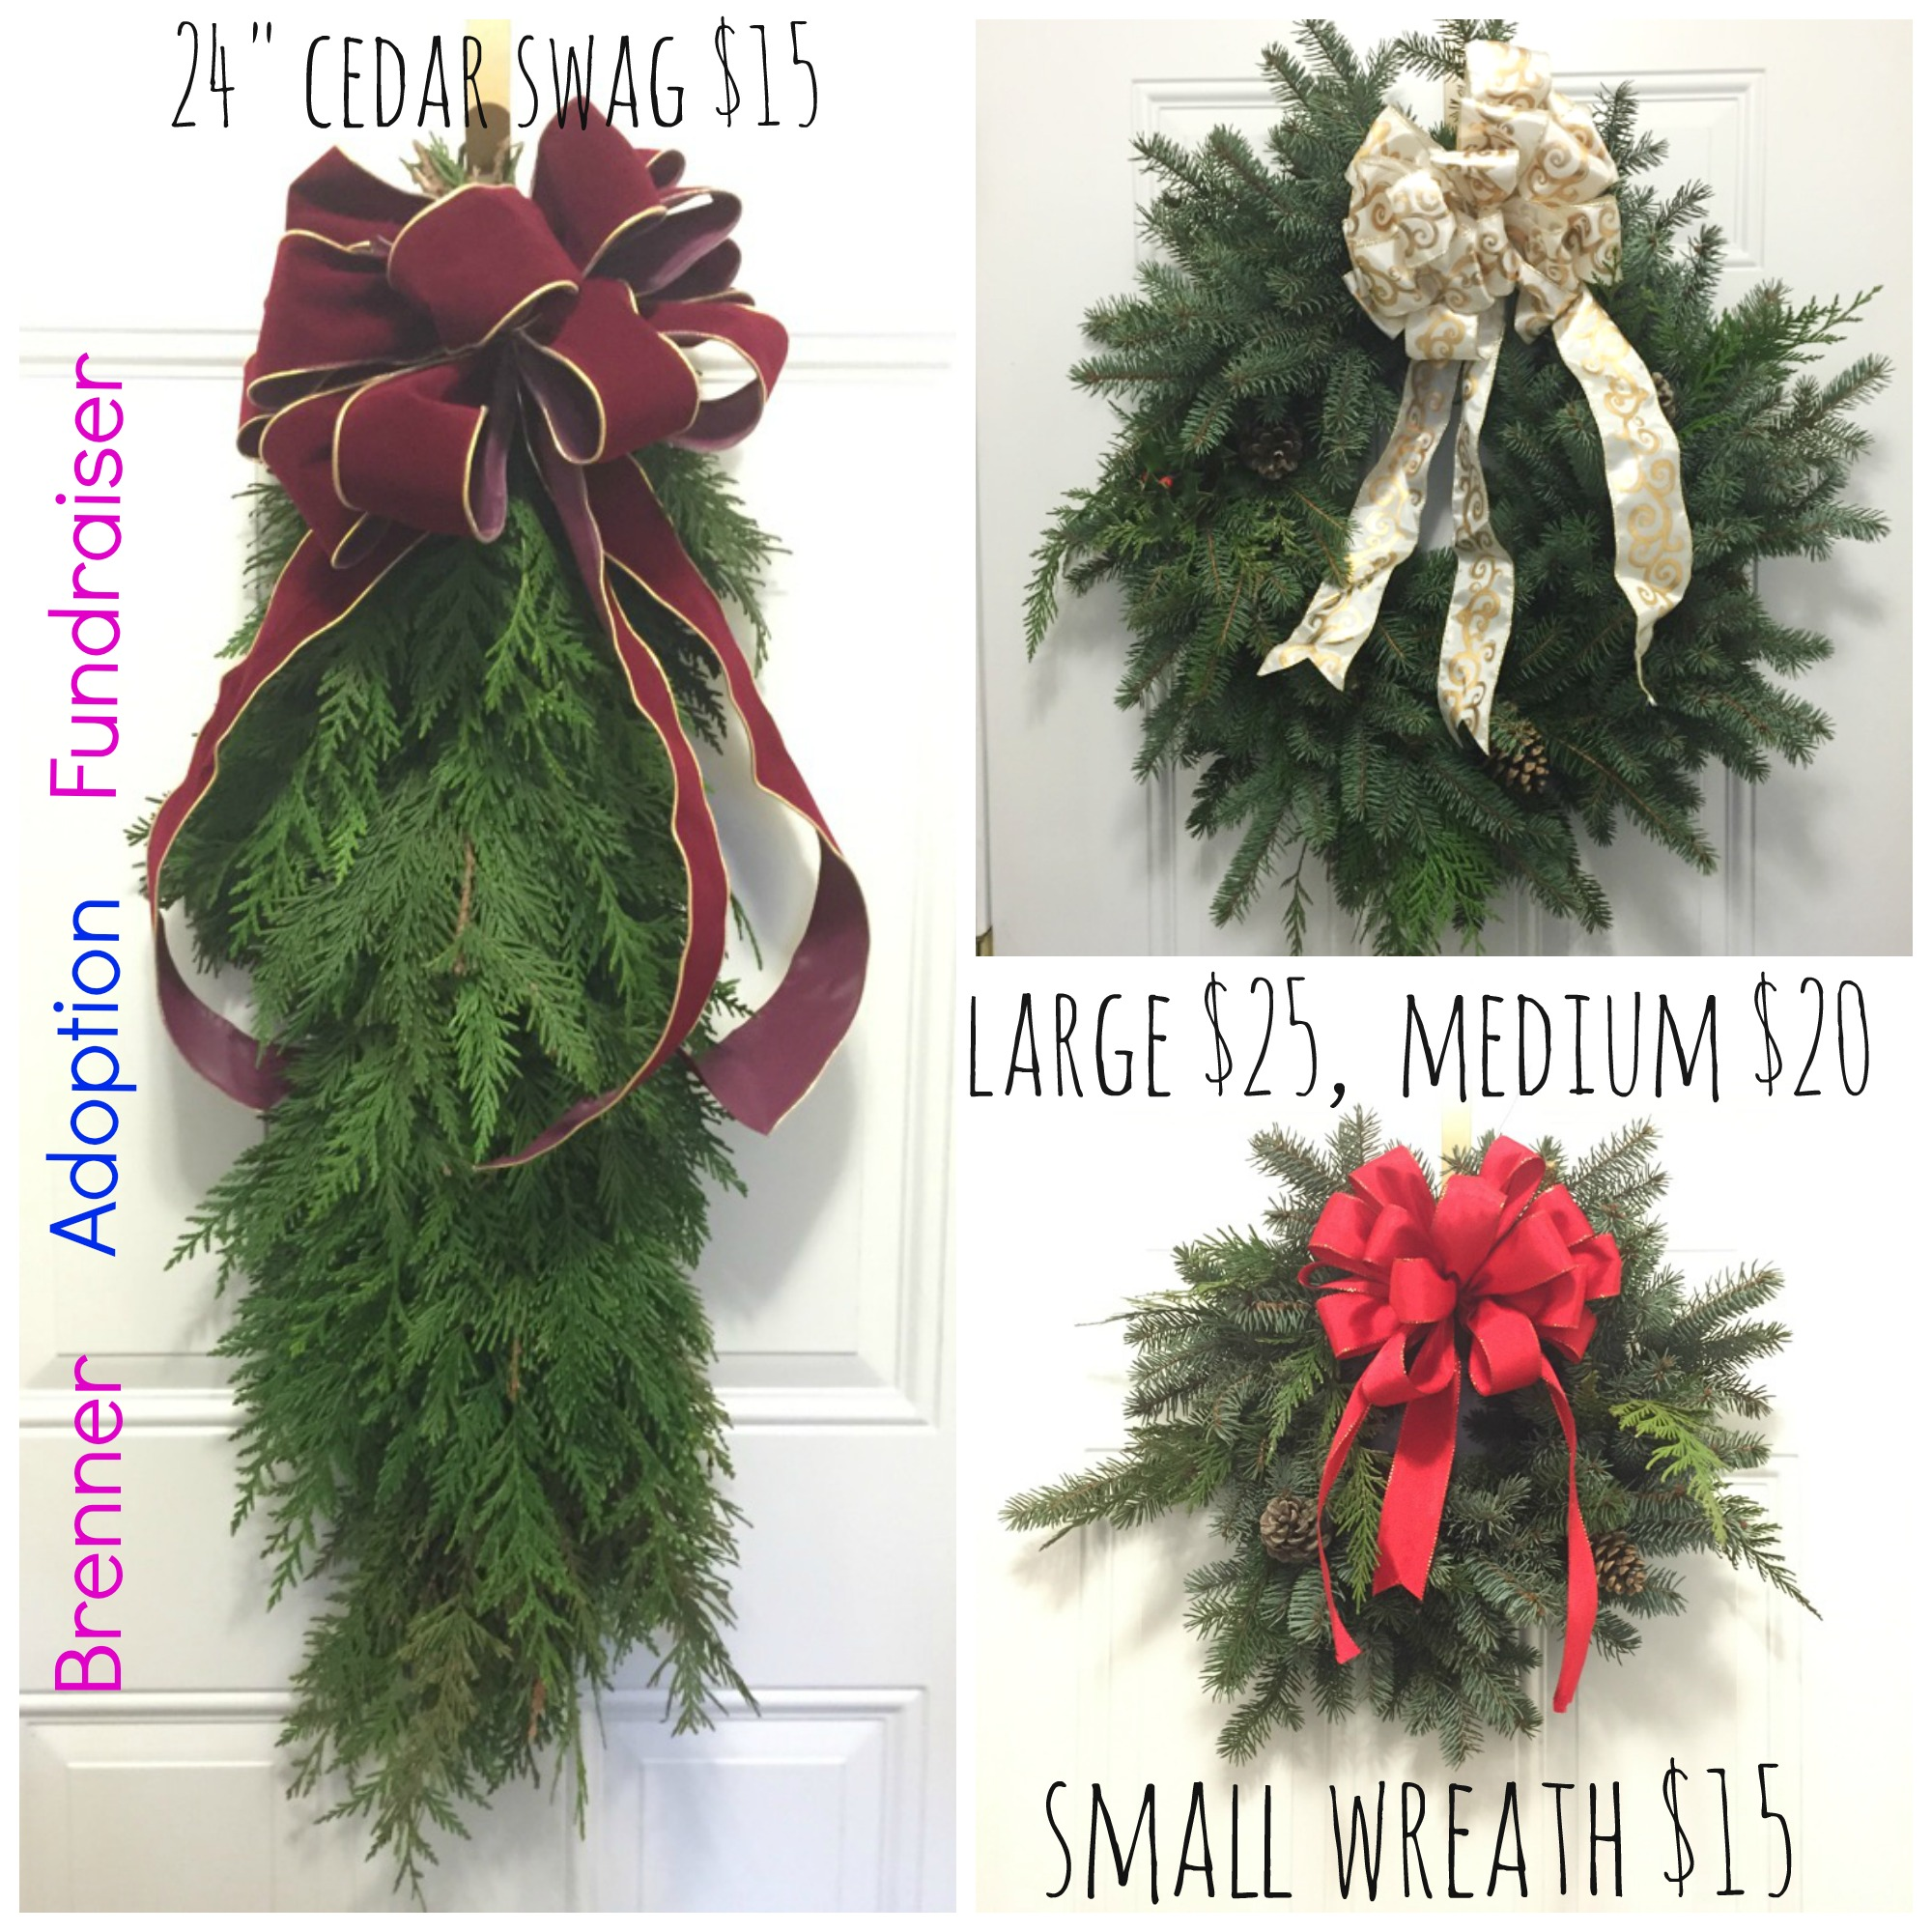 wreath adoption fundraiser image